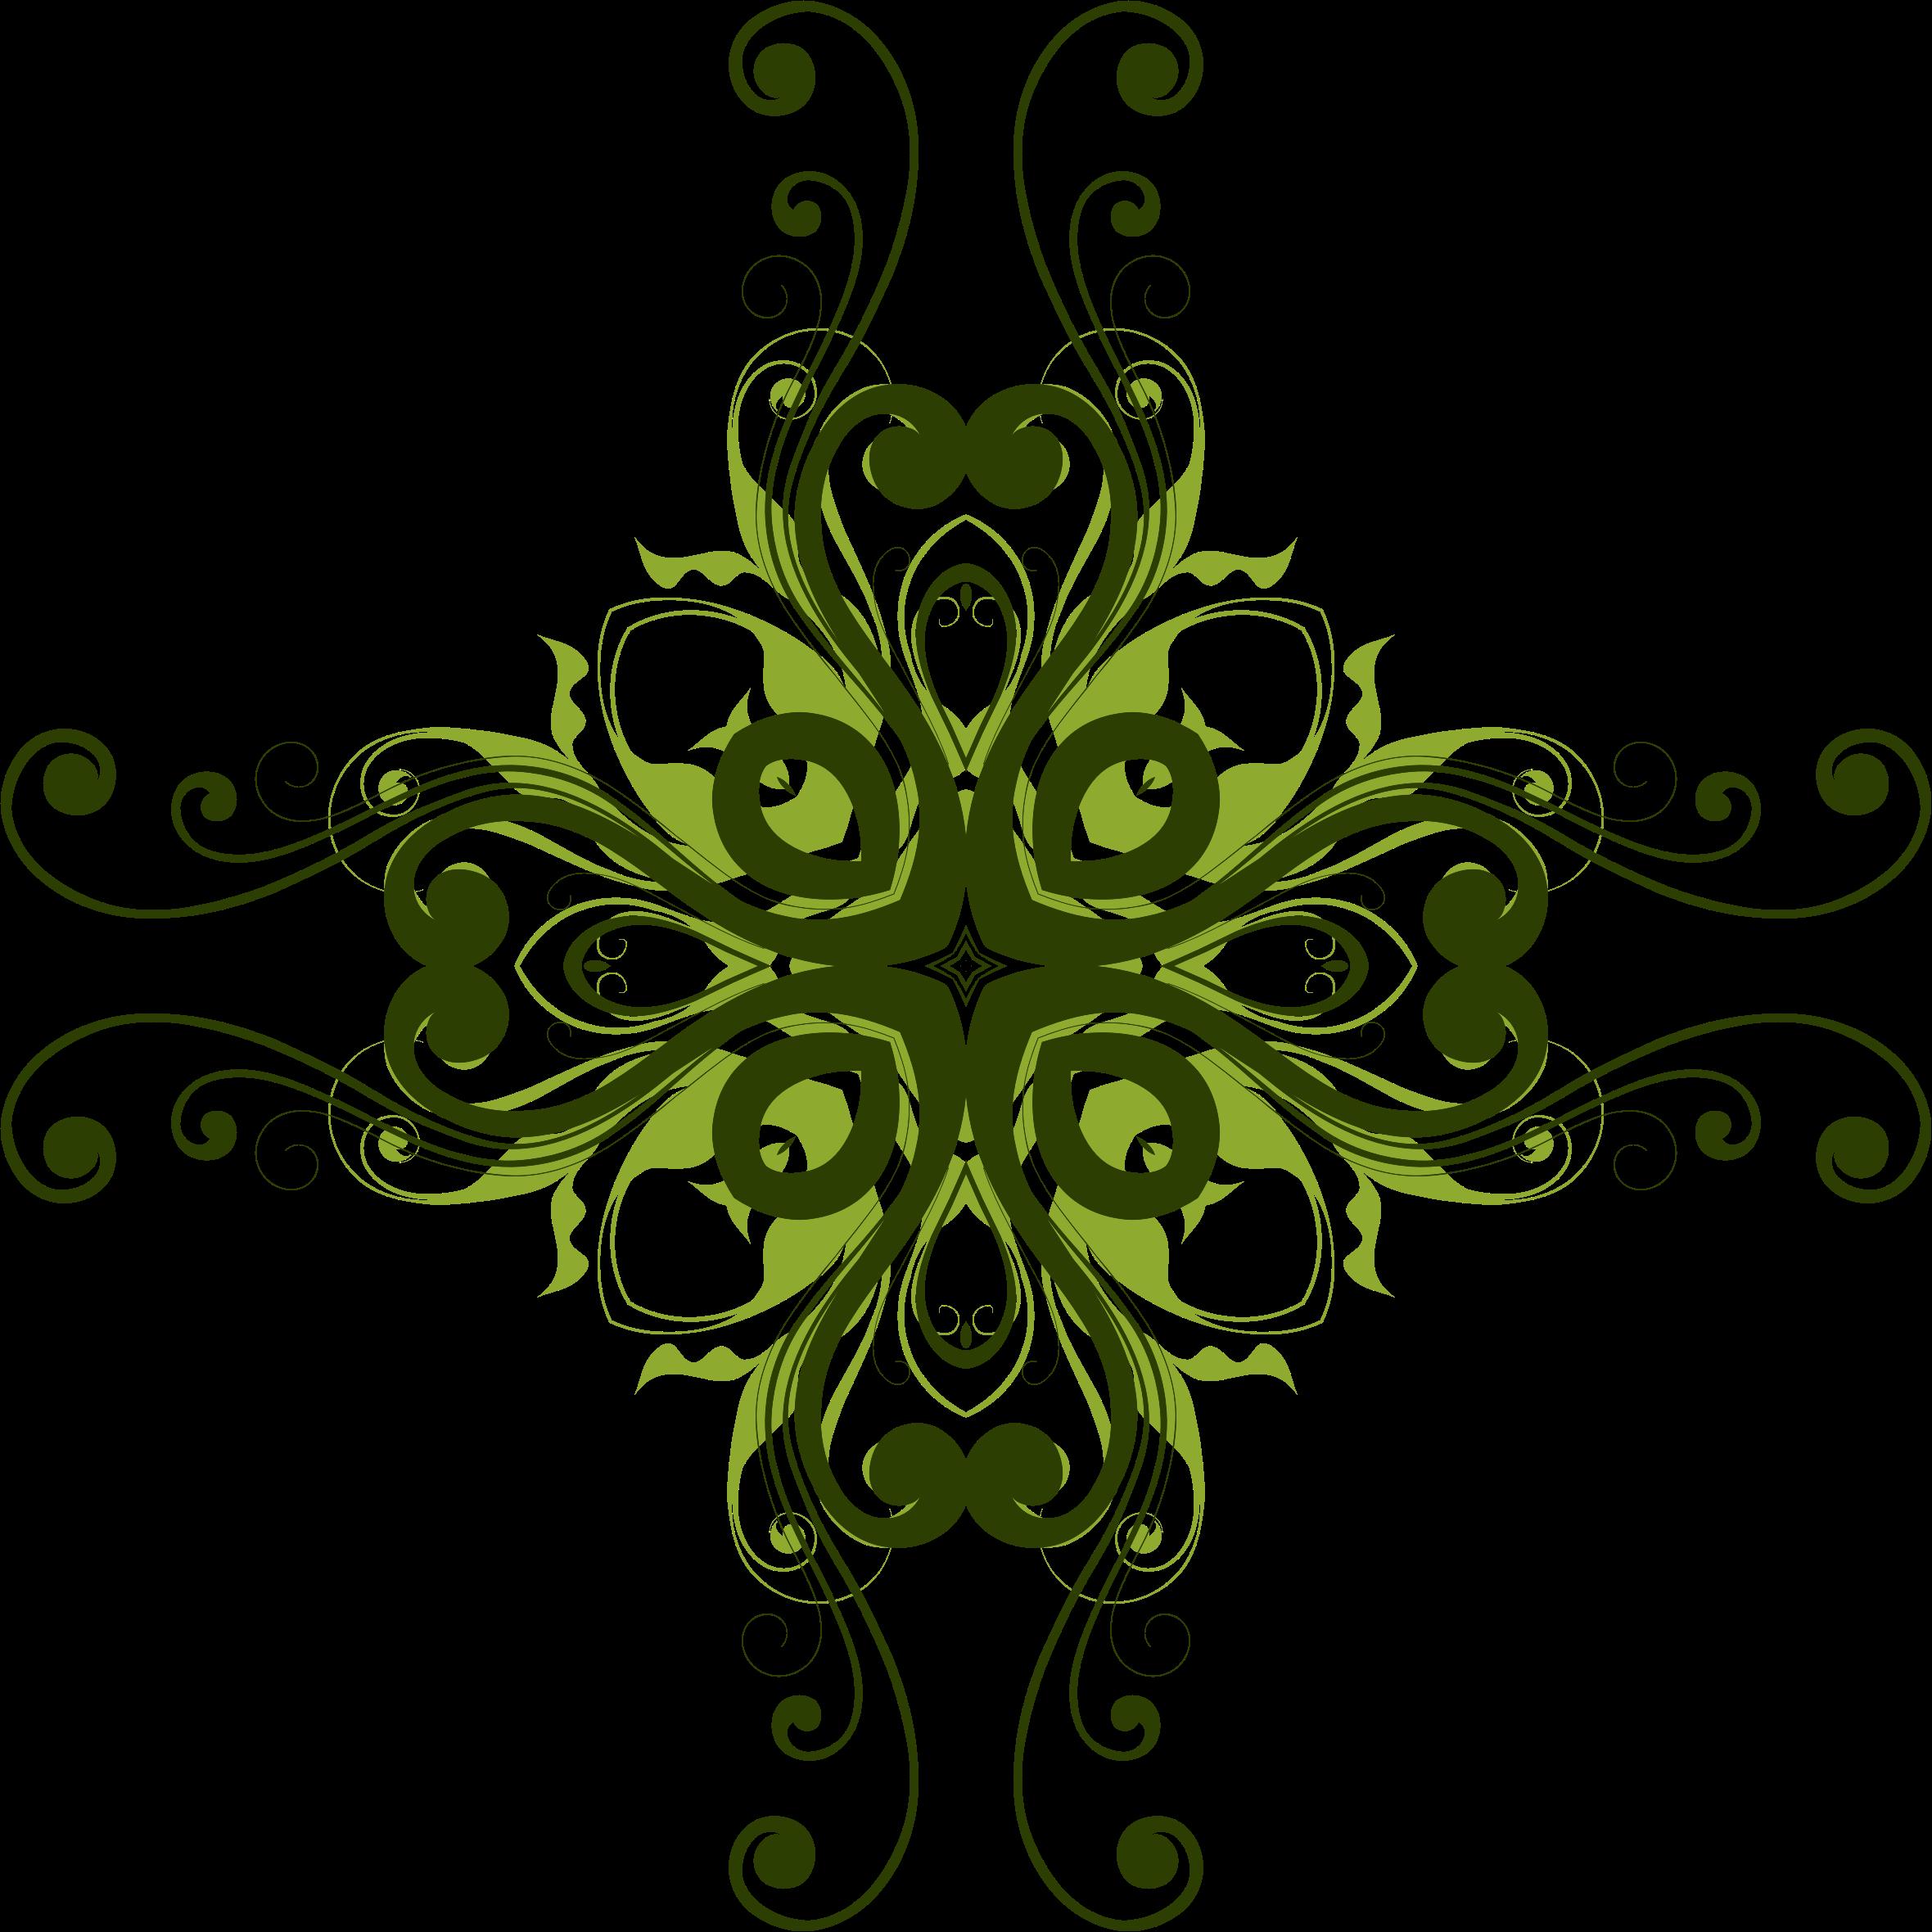 Flower design big image. Flourish clipart small